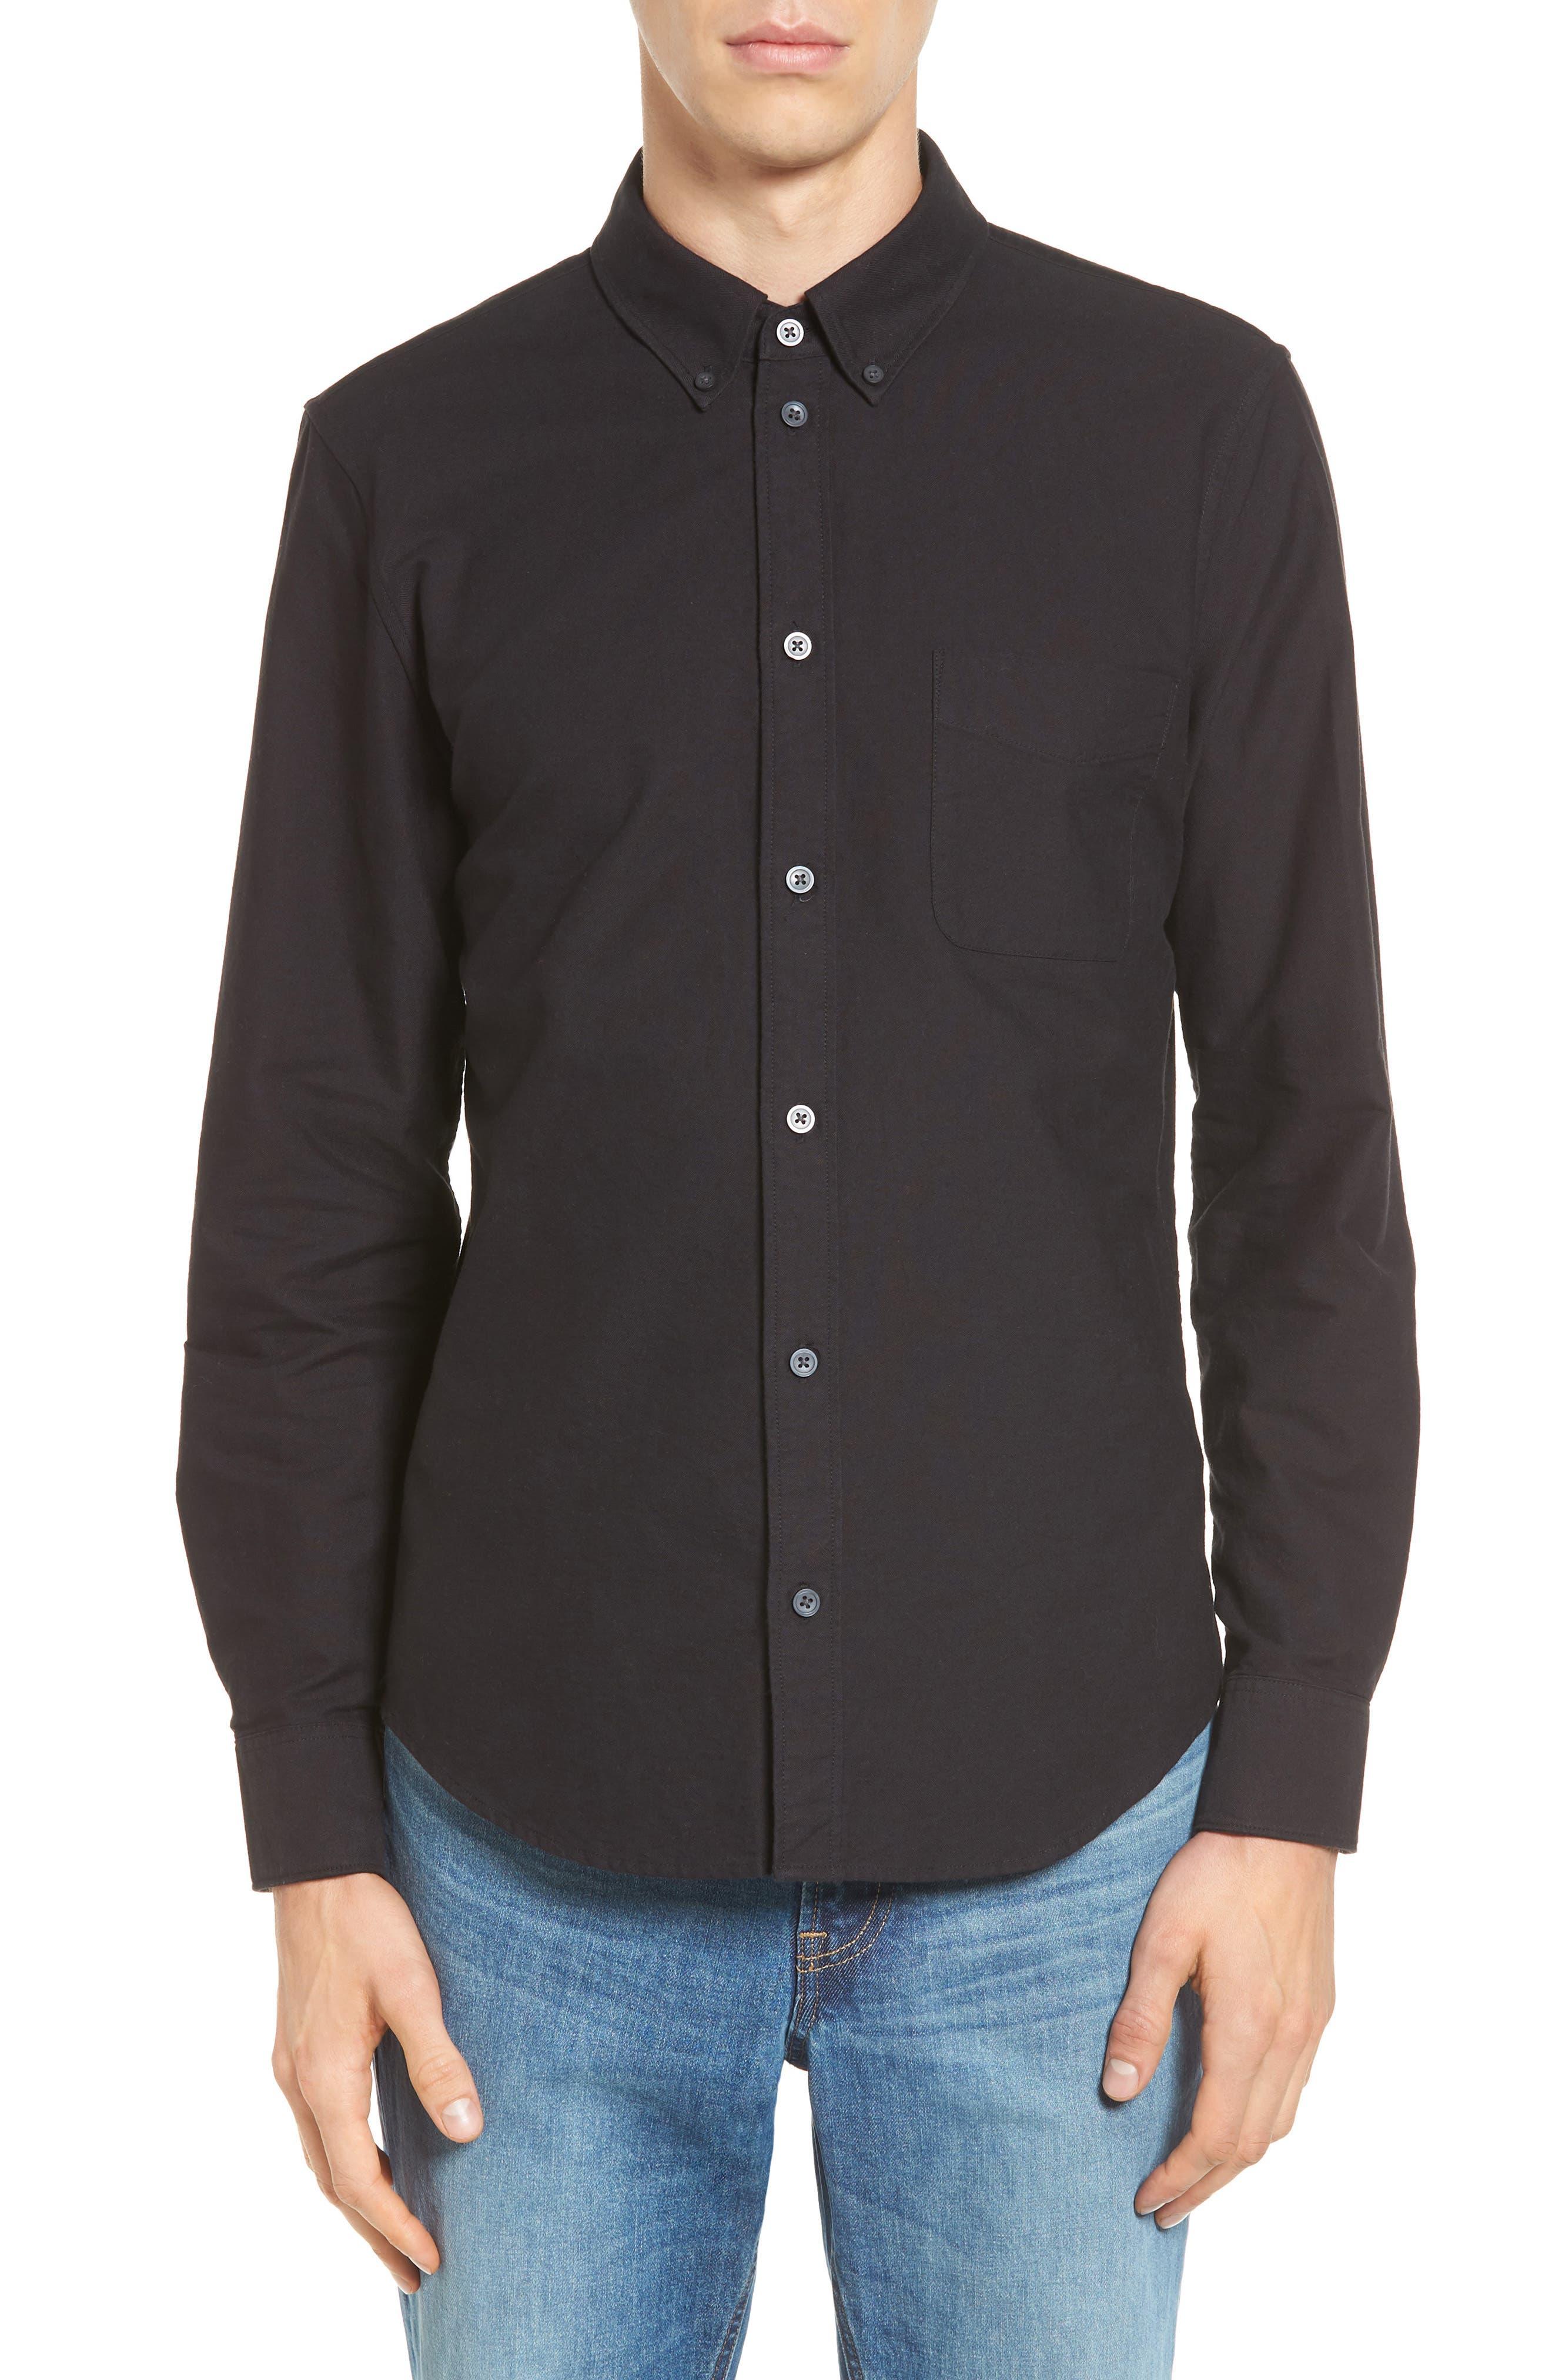 Alternate Image 1 Selected - Everlane The Japanese Slim Fit Oxford Shirt